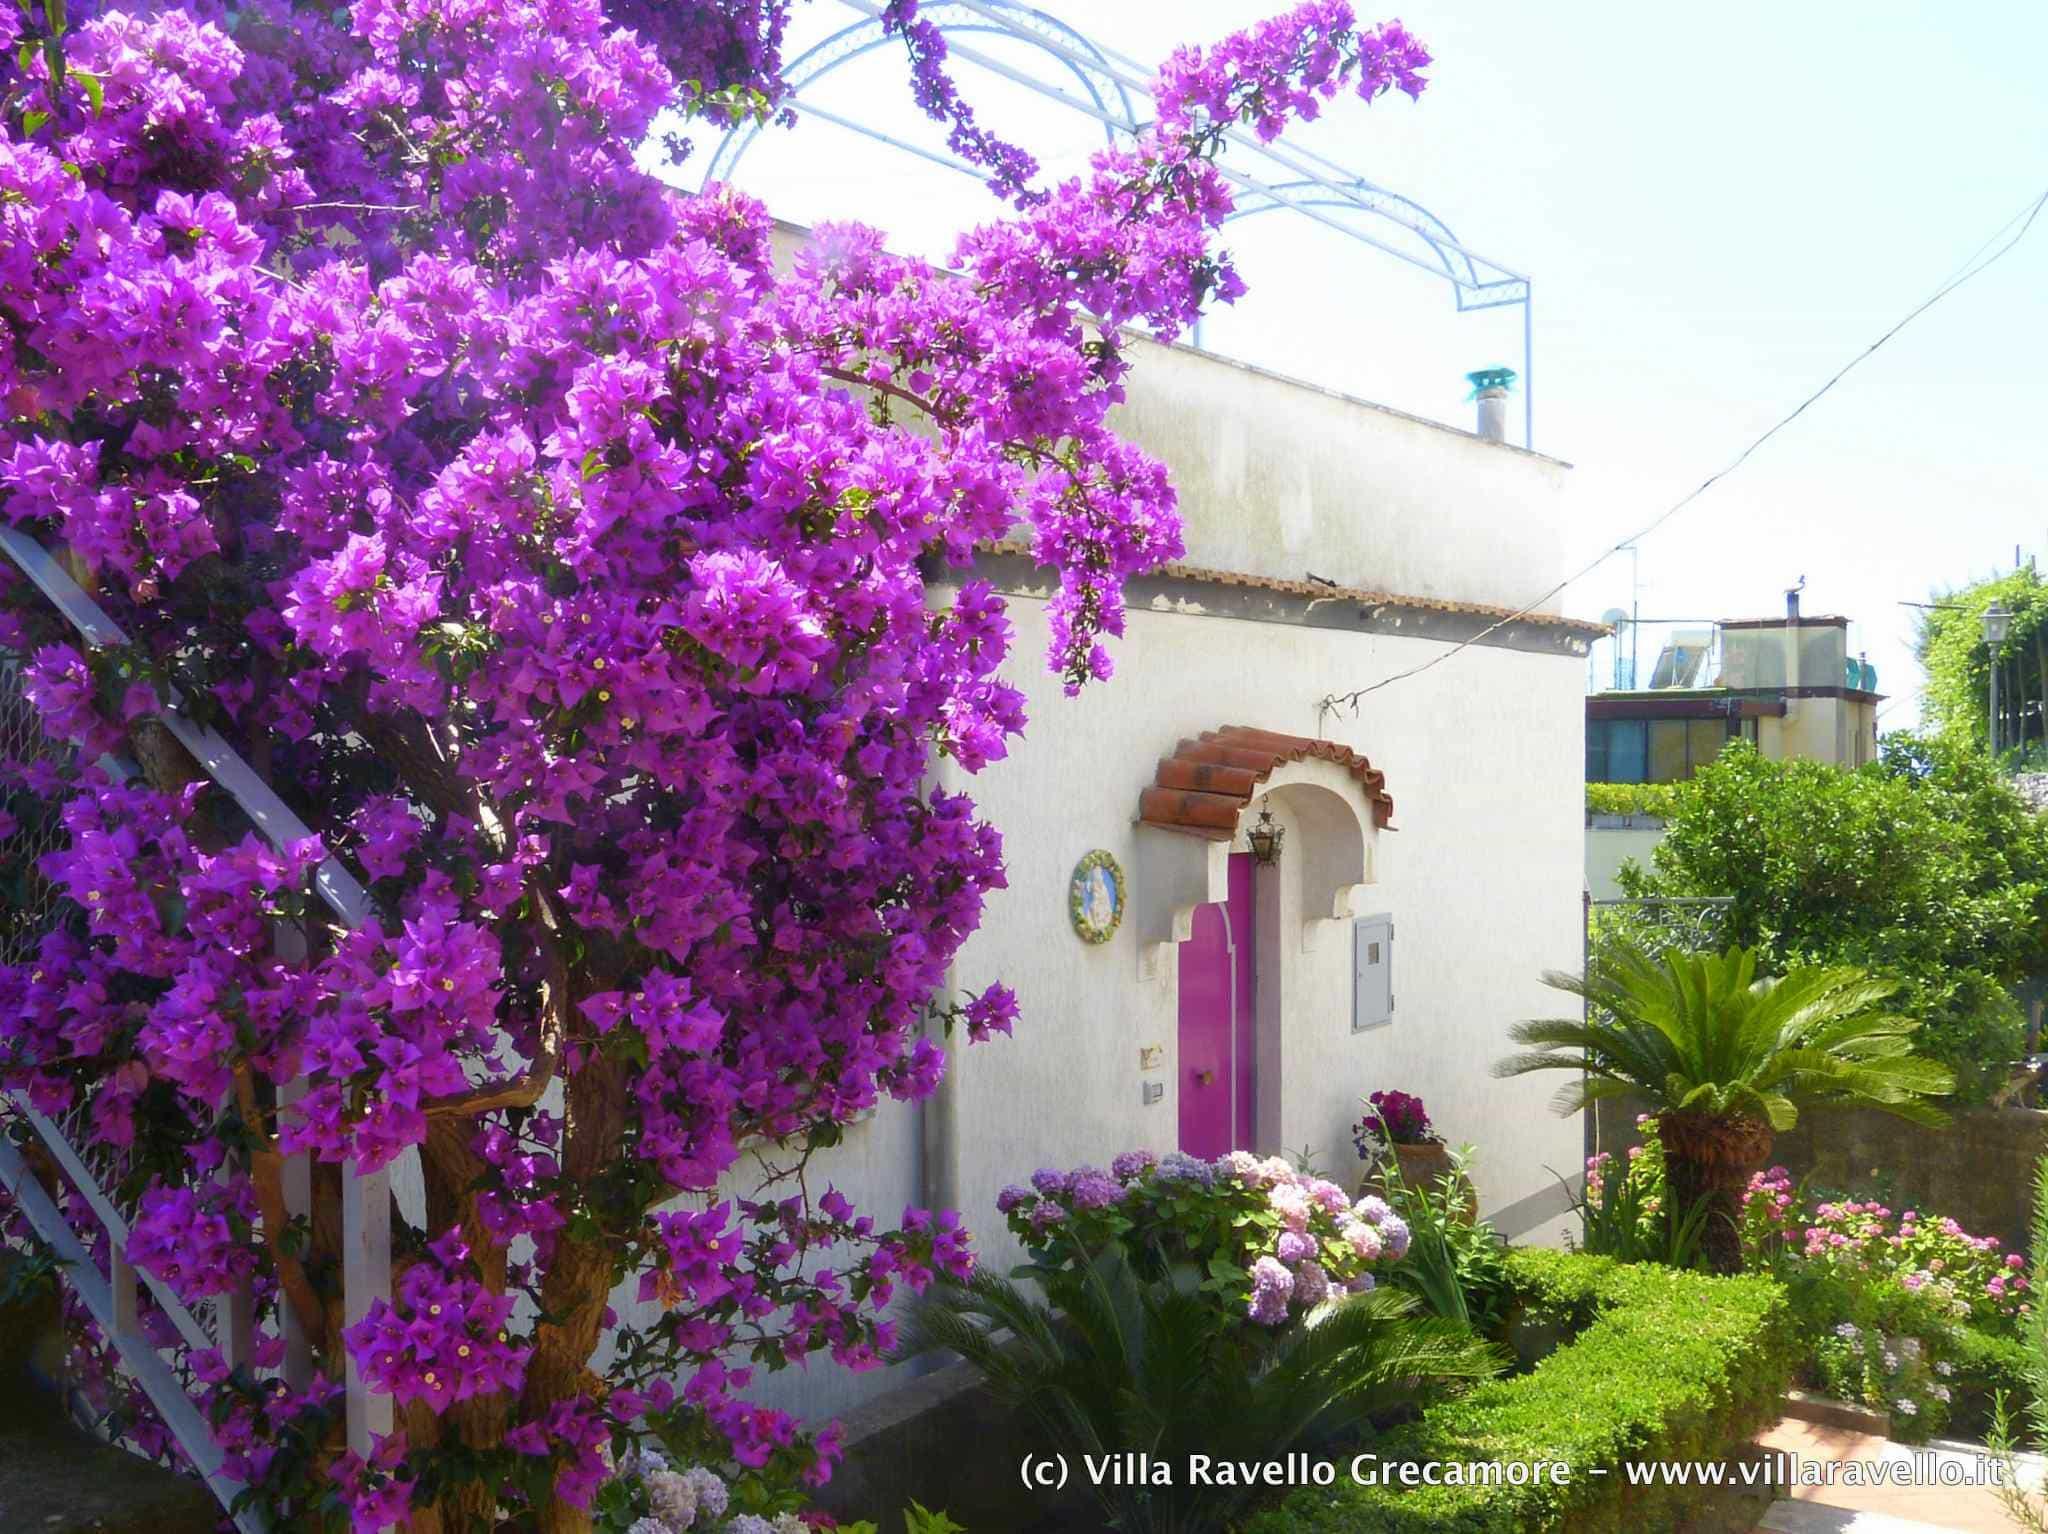 Villa Ravello Grecamore - main entrance